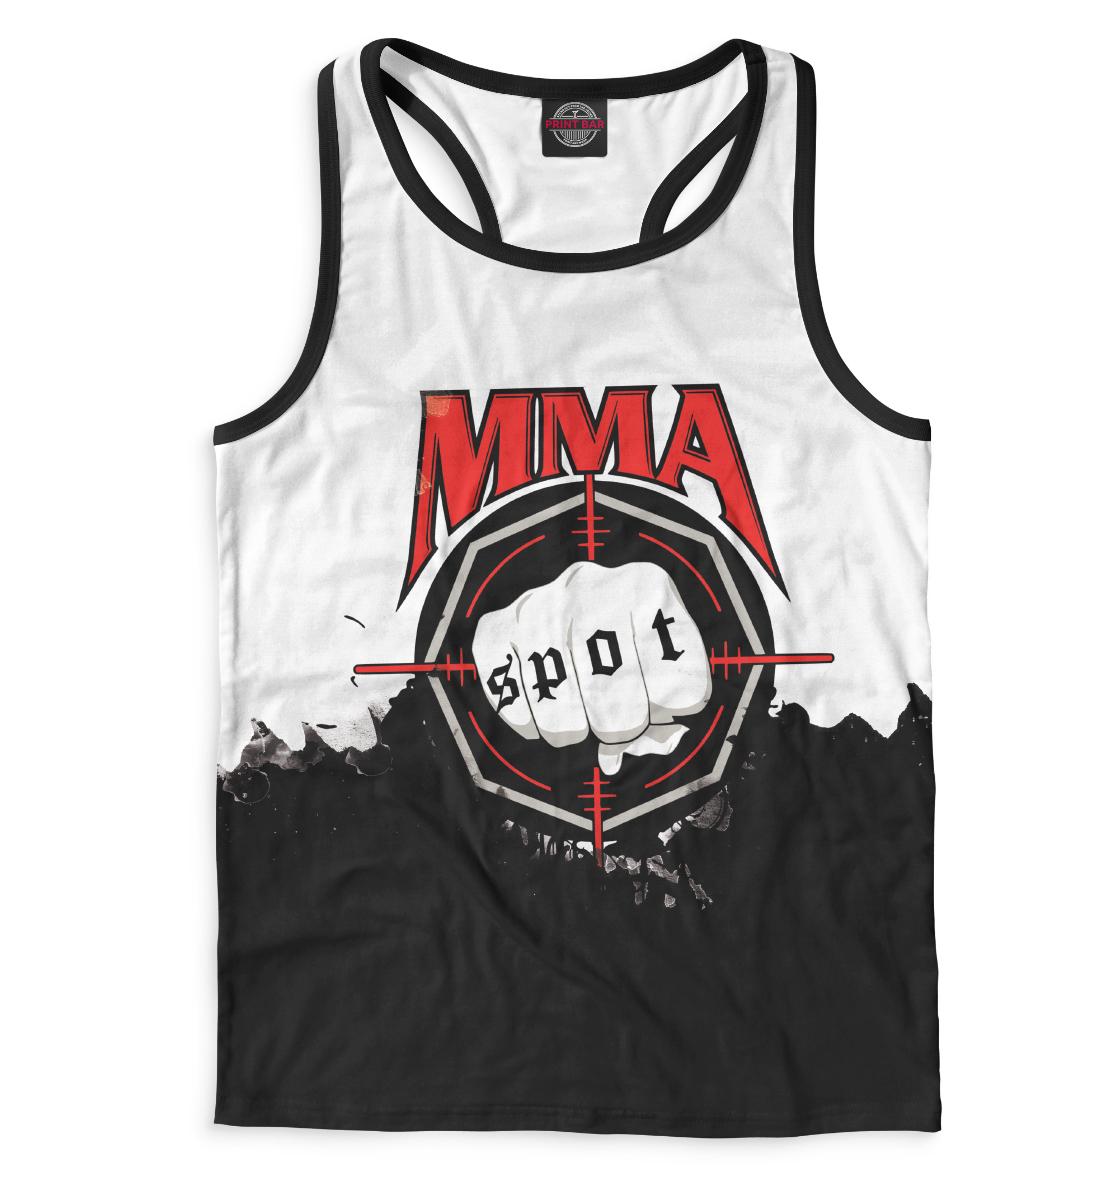 Купить MMA Spot, Printbar, Майки борцовки, MNU-360534-mayb-2